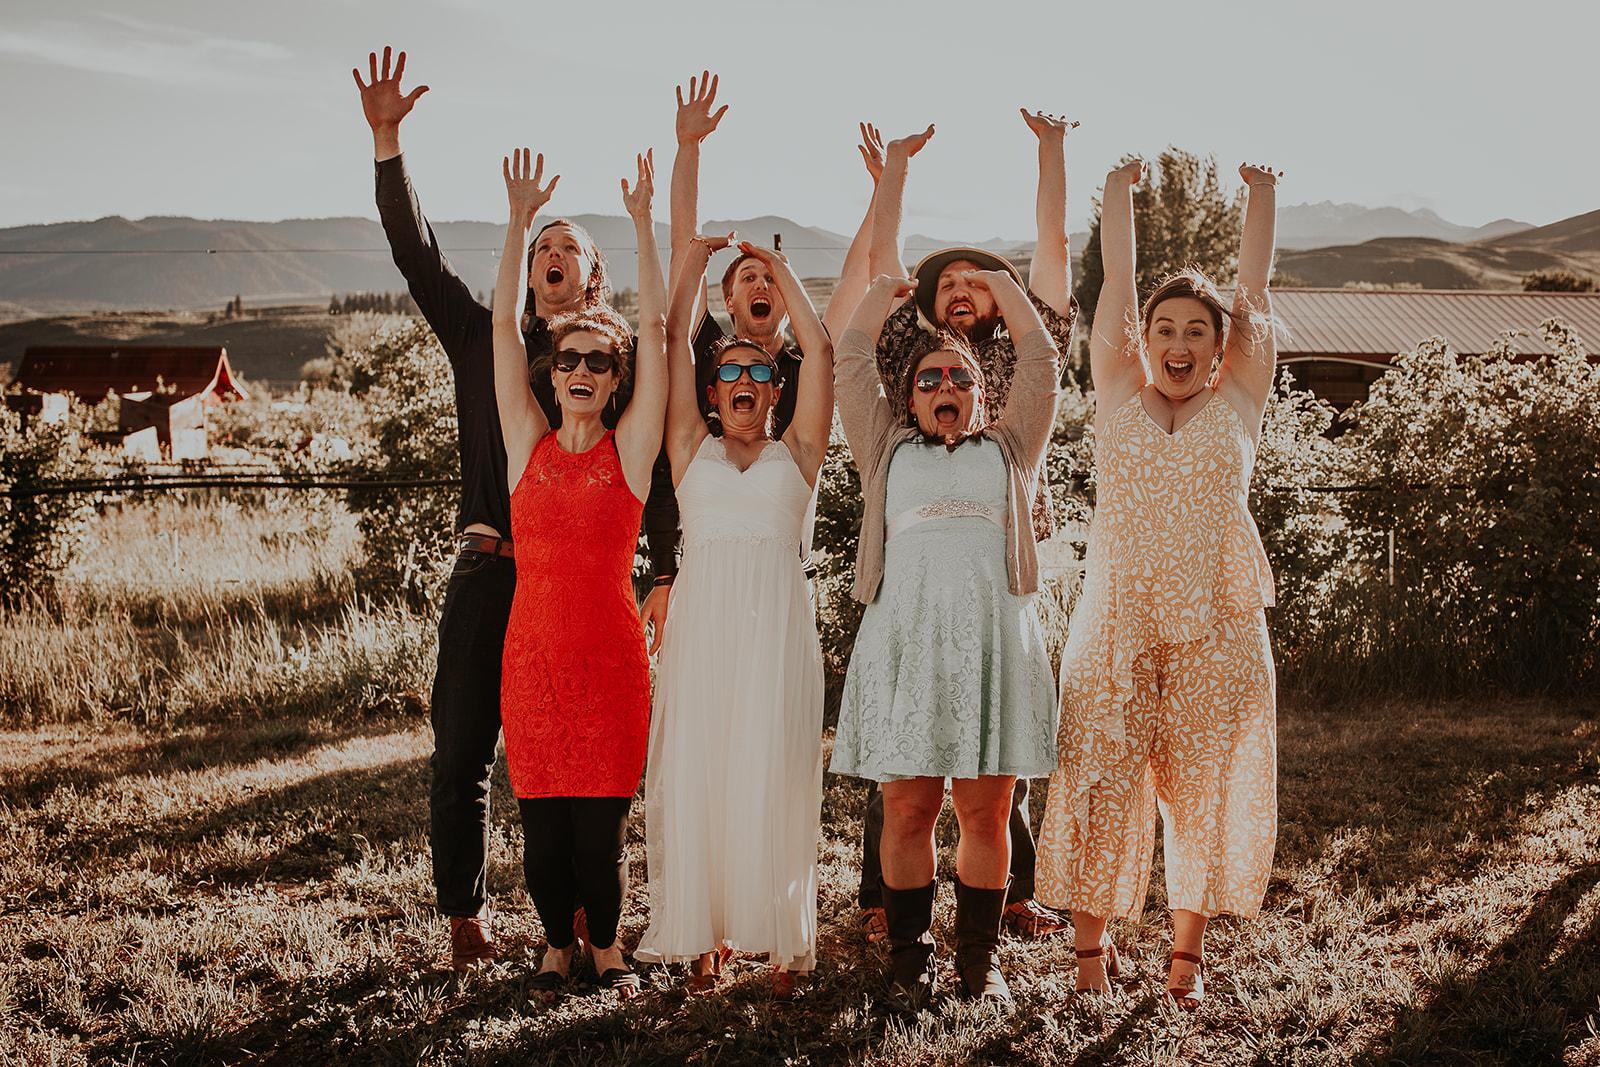 north-cascades-elopement-wedding-winthrop-wedding-photographer-megan-gallagher-photography (16).jpg